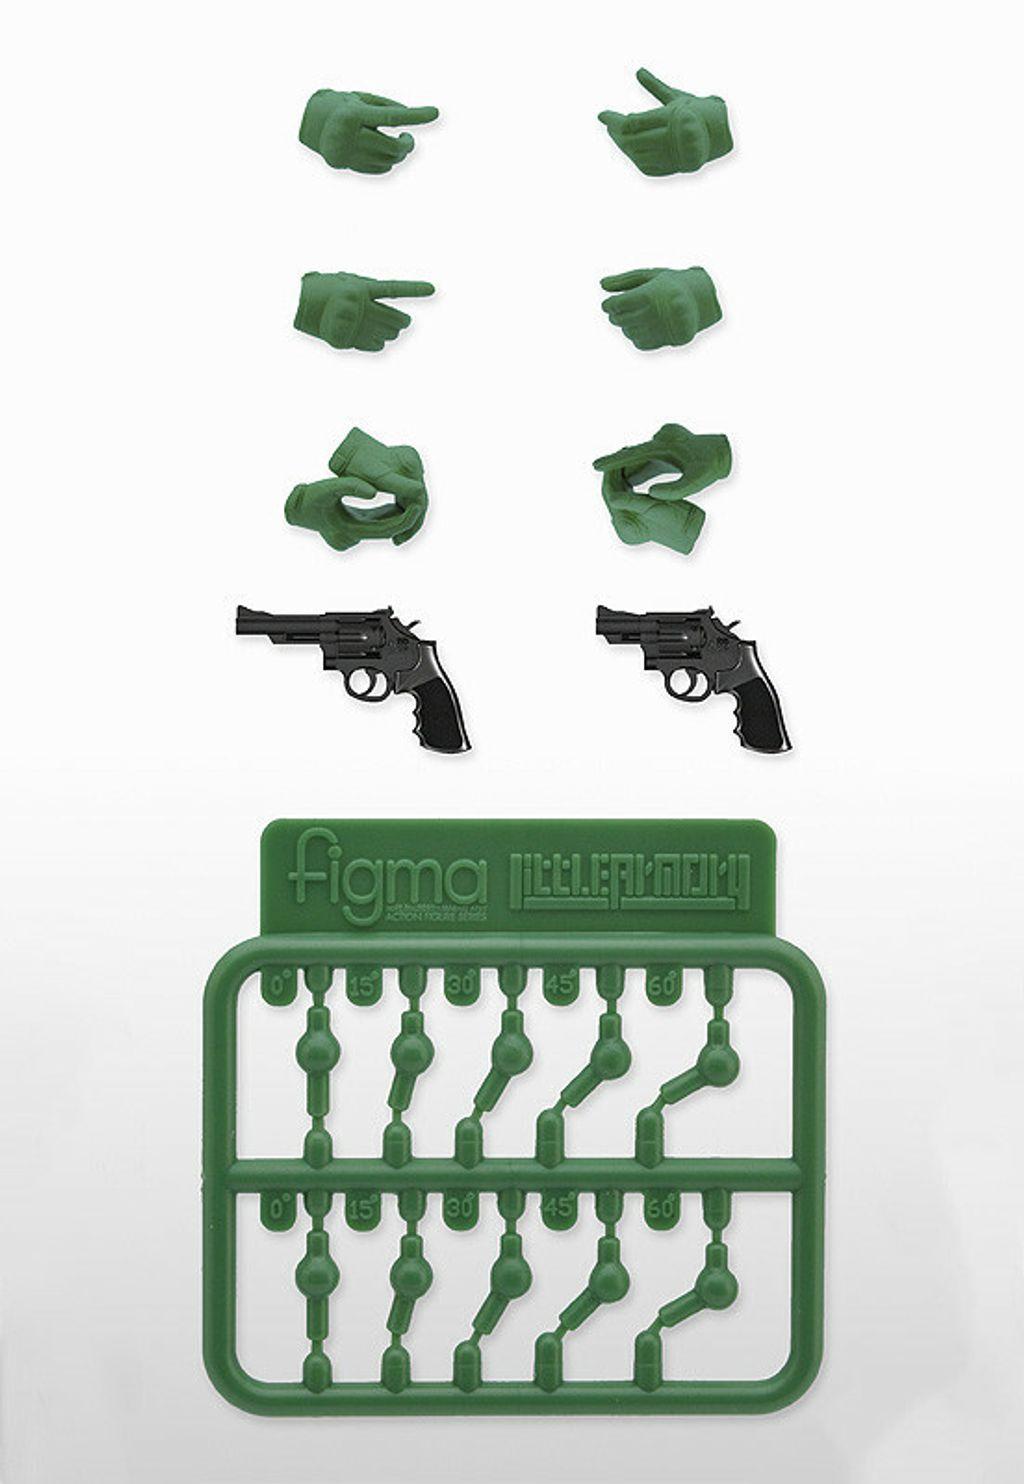 LAOP07 figma Tactical Gloves 2 - Revolver Set (Green).jpg